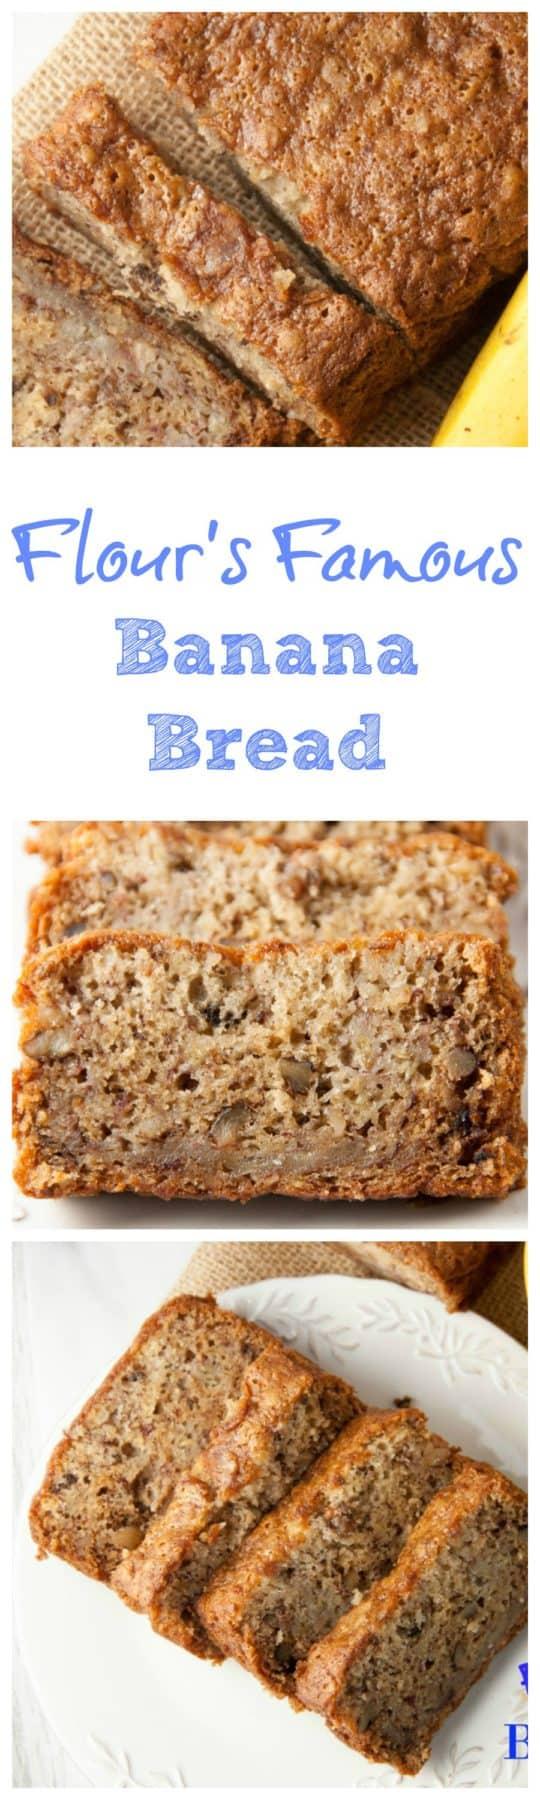 Flours famous banana bread boston girl bakes flours famous banana bread forumfinder Images